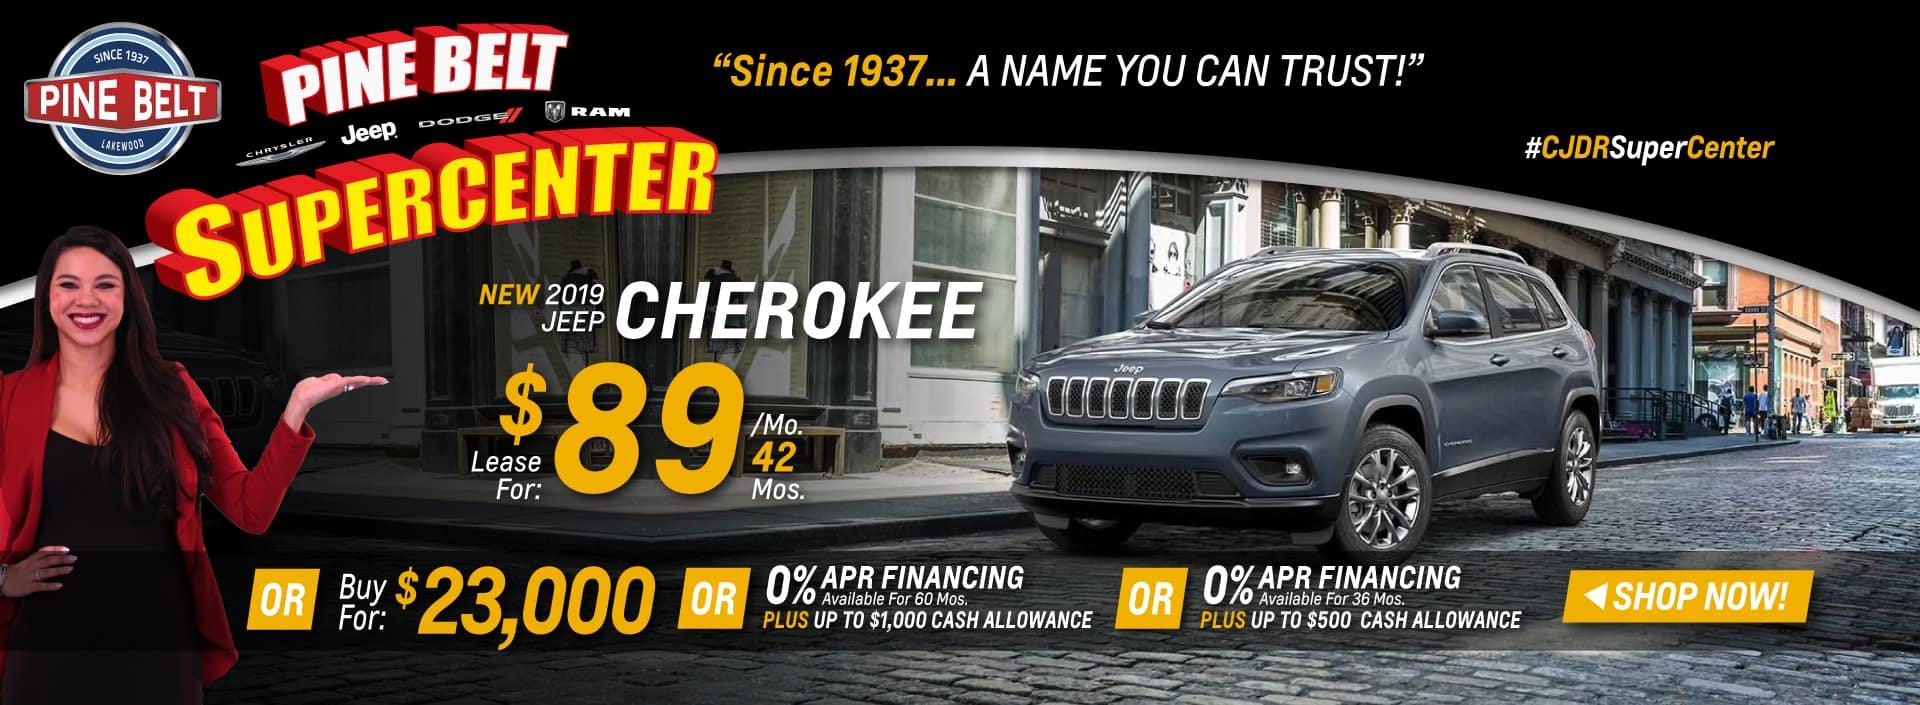 2019 Jeep Cherokee Sales Deals or Special in NJ